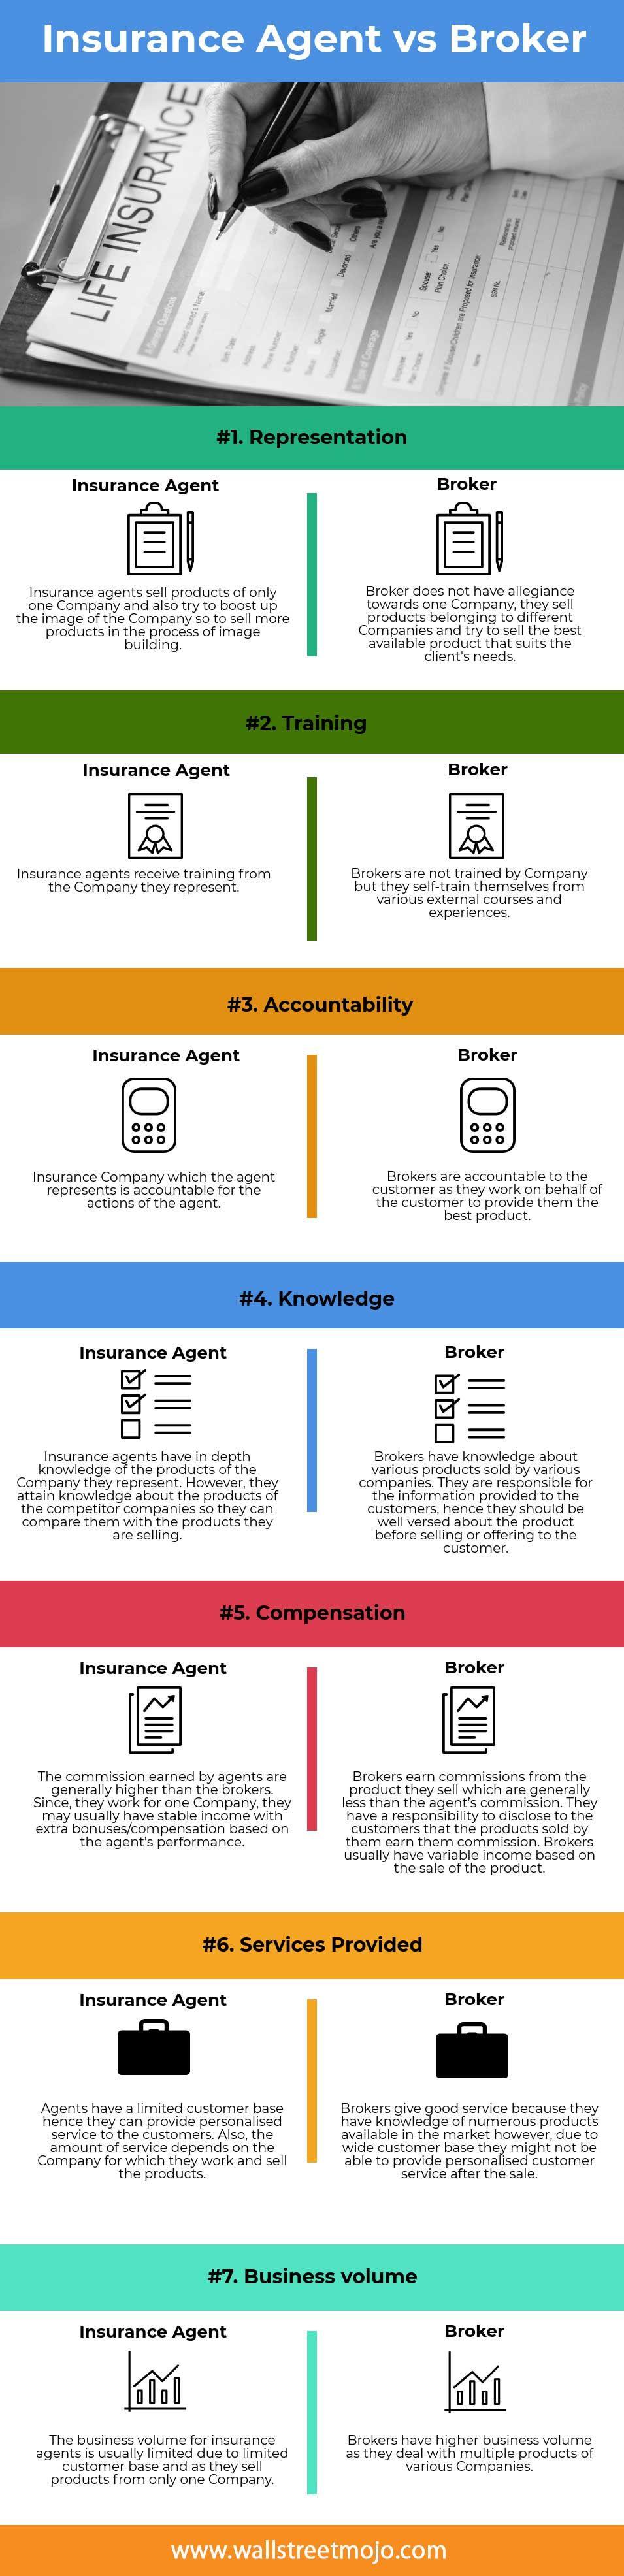 Insurance Company Vs Broker